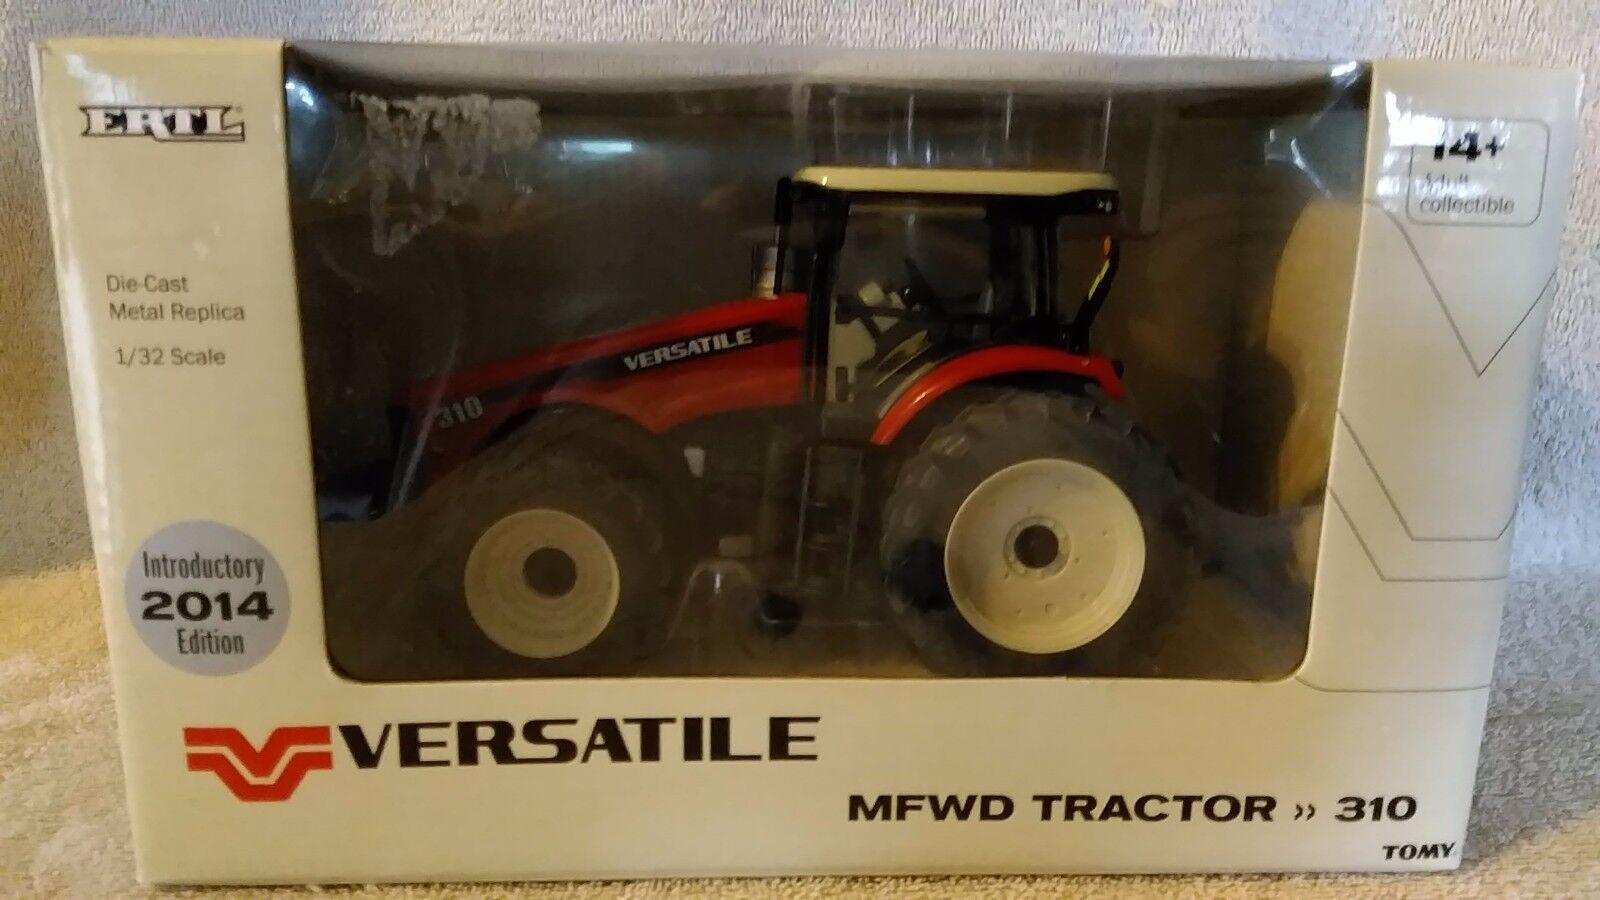 2014 Ertl 1 32 scale Versatile 310 MFWD Tractor, Introductory Edition 2014 NIB